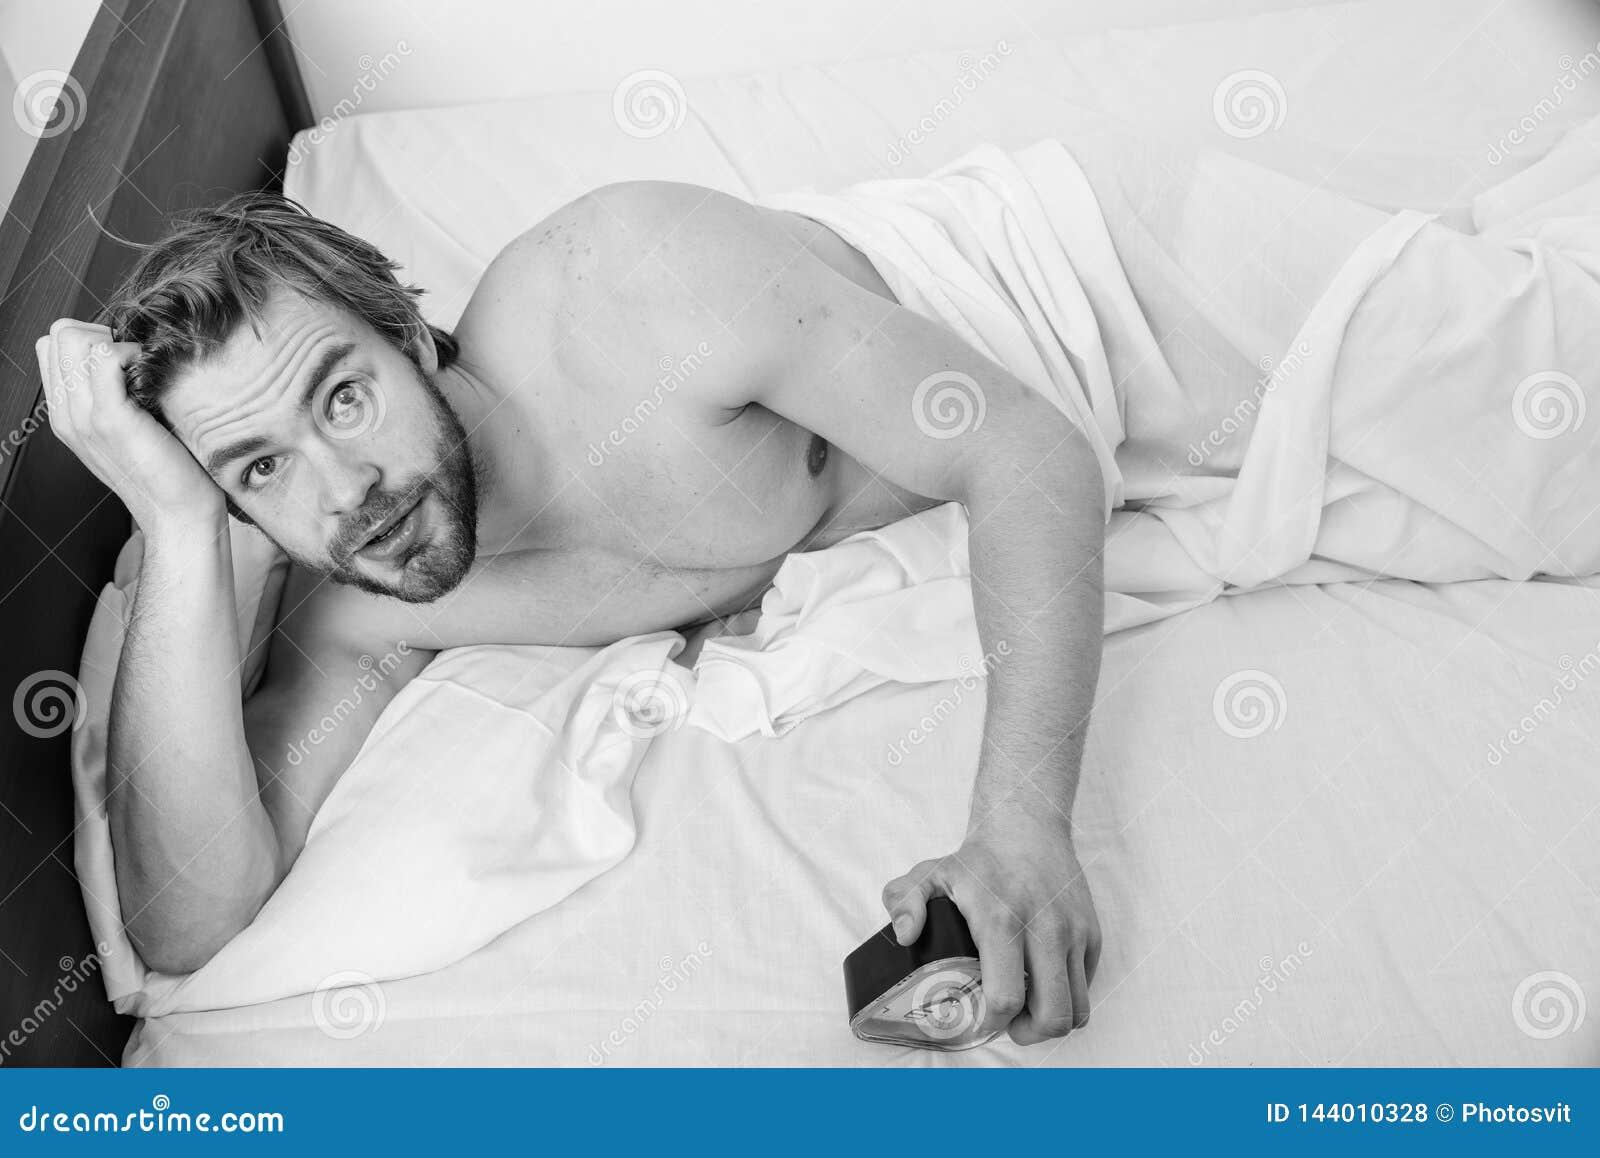 Regulate your bodys clock. Sleep regime habit. Man unshaven lay bed hold alarm clock. Man unshaven bearded wakeful face